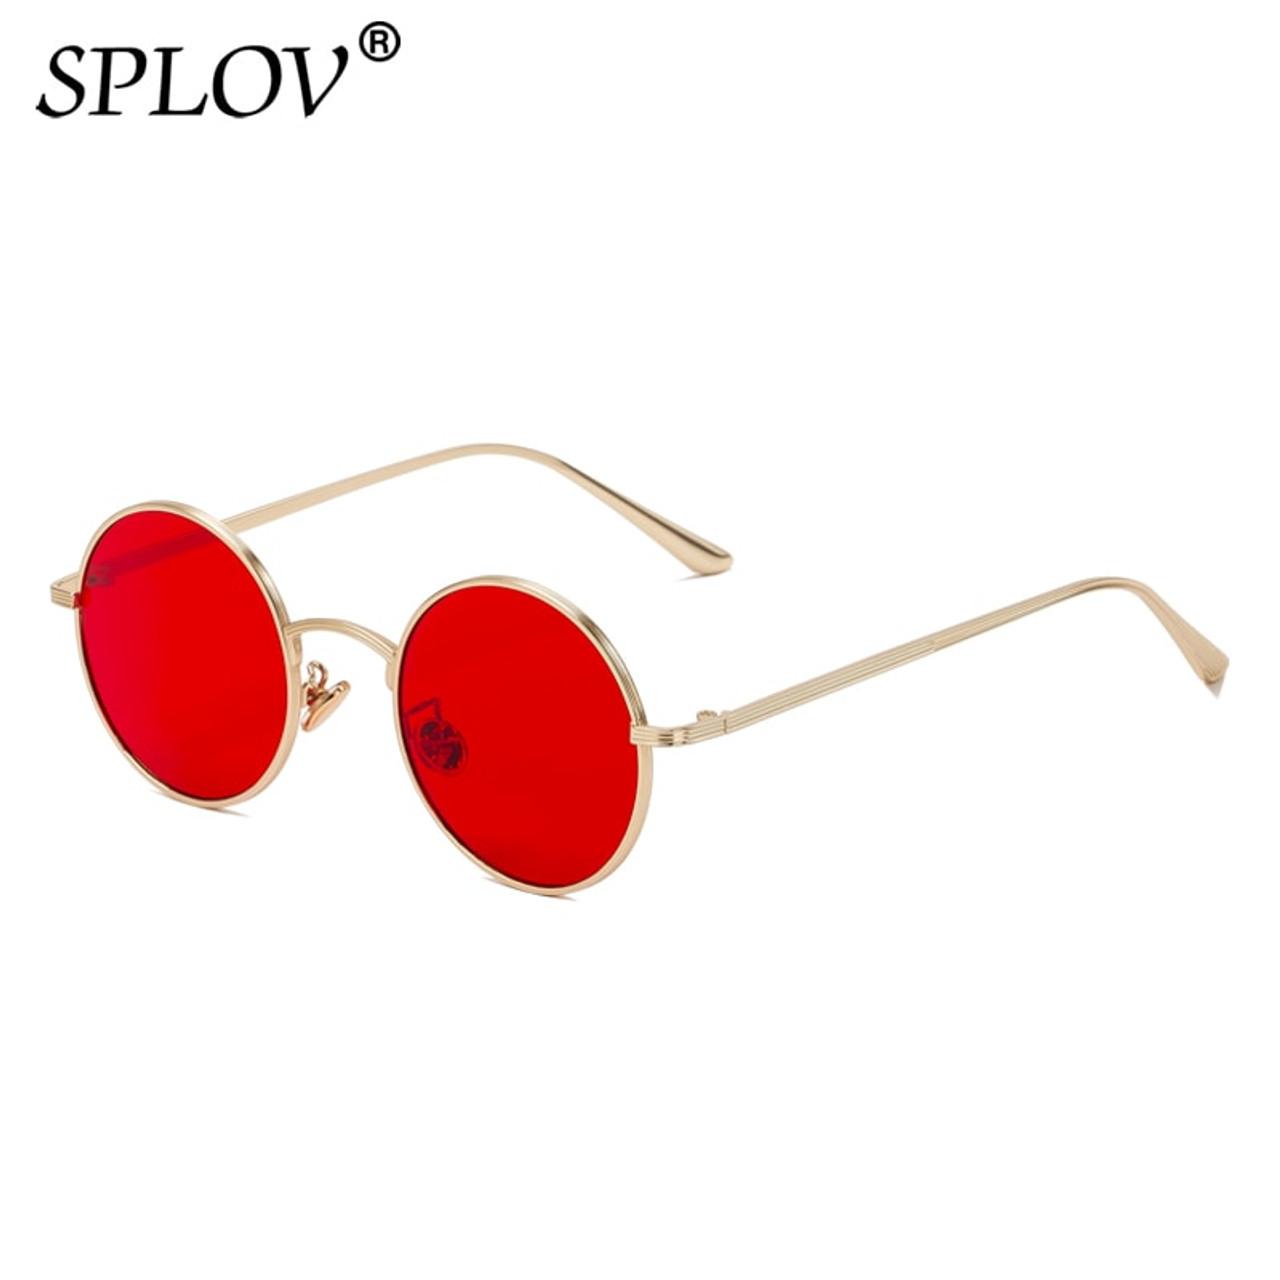 d9bd0a2583bd ... SPLOV Vintage Men Sunglasses Women Retro Punk Style Round Metal Frame  Colorful Lens Sun Glasses Fashion ...